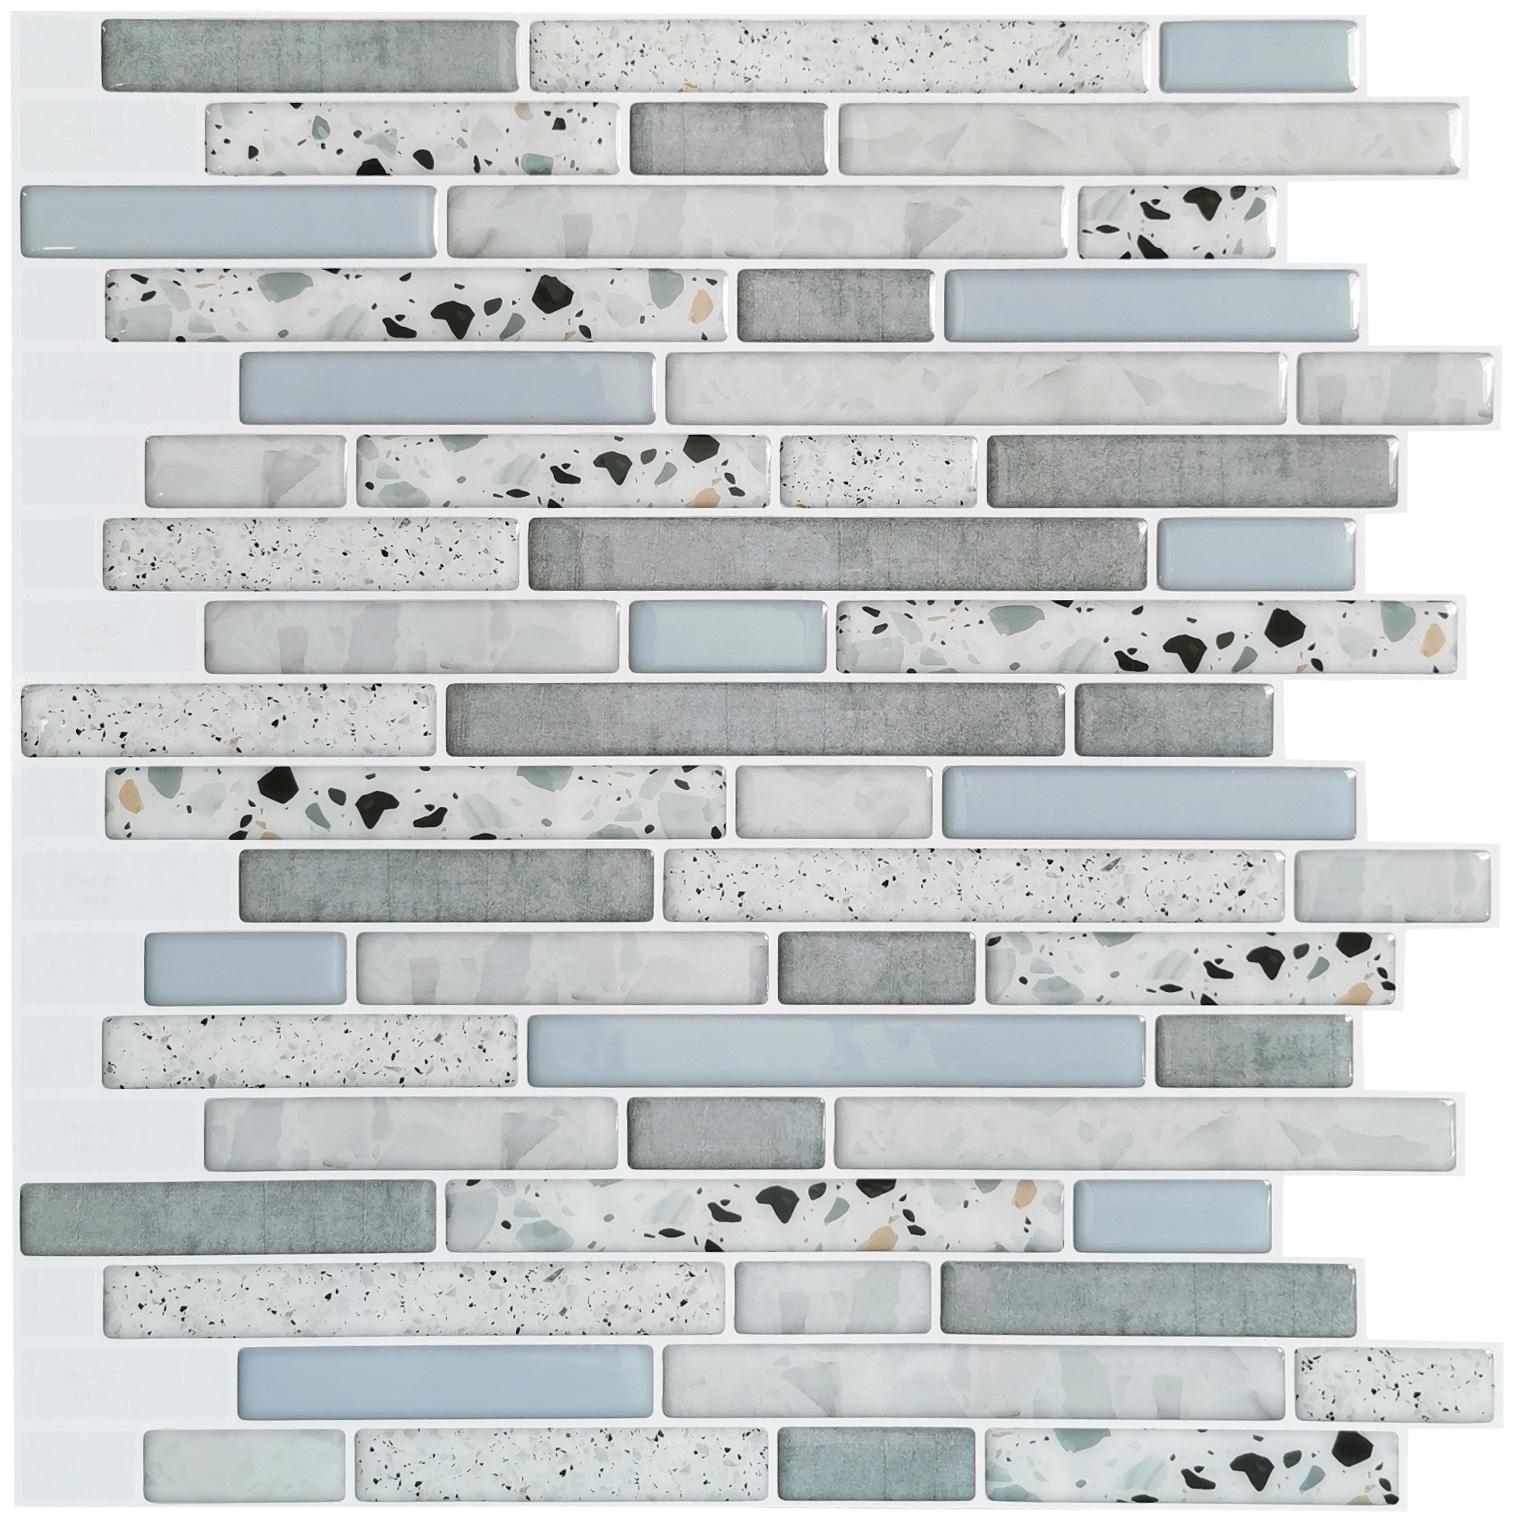 Art3d 10-Piece Peel and Stick Backsplash Tile 12